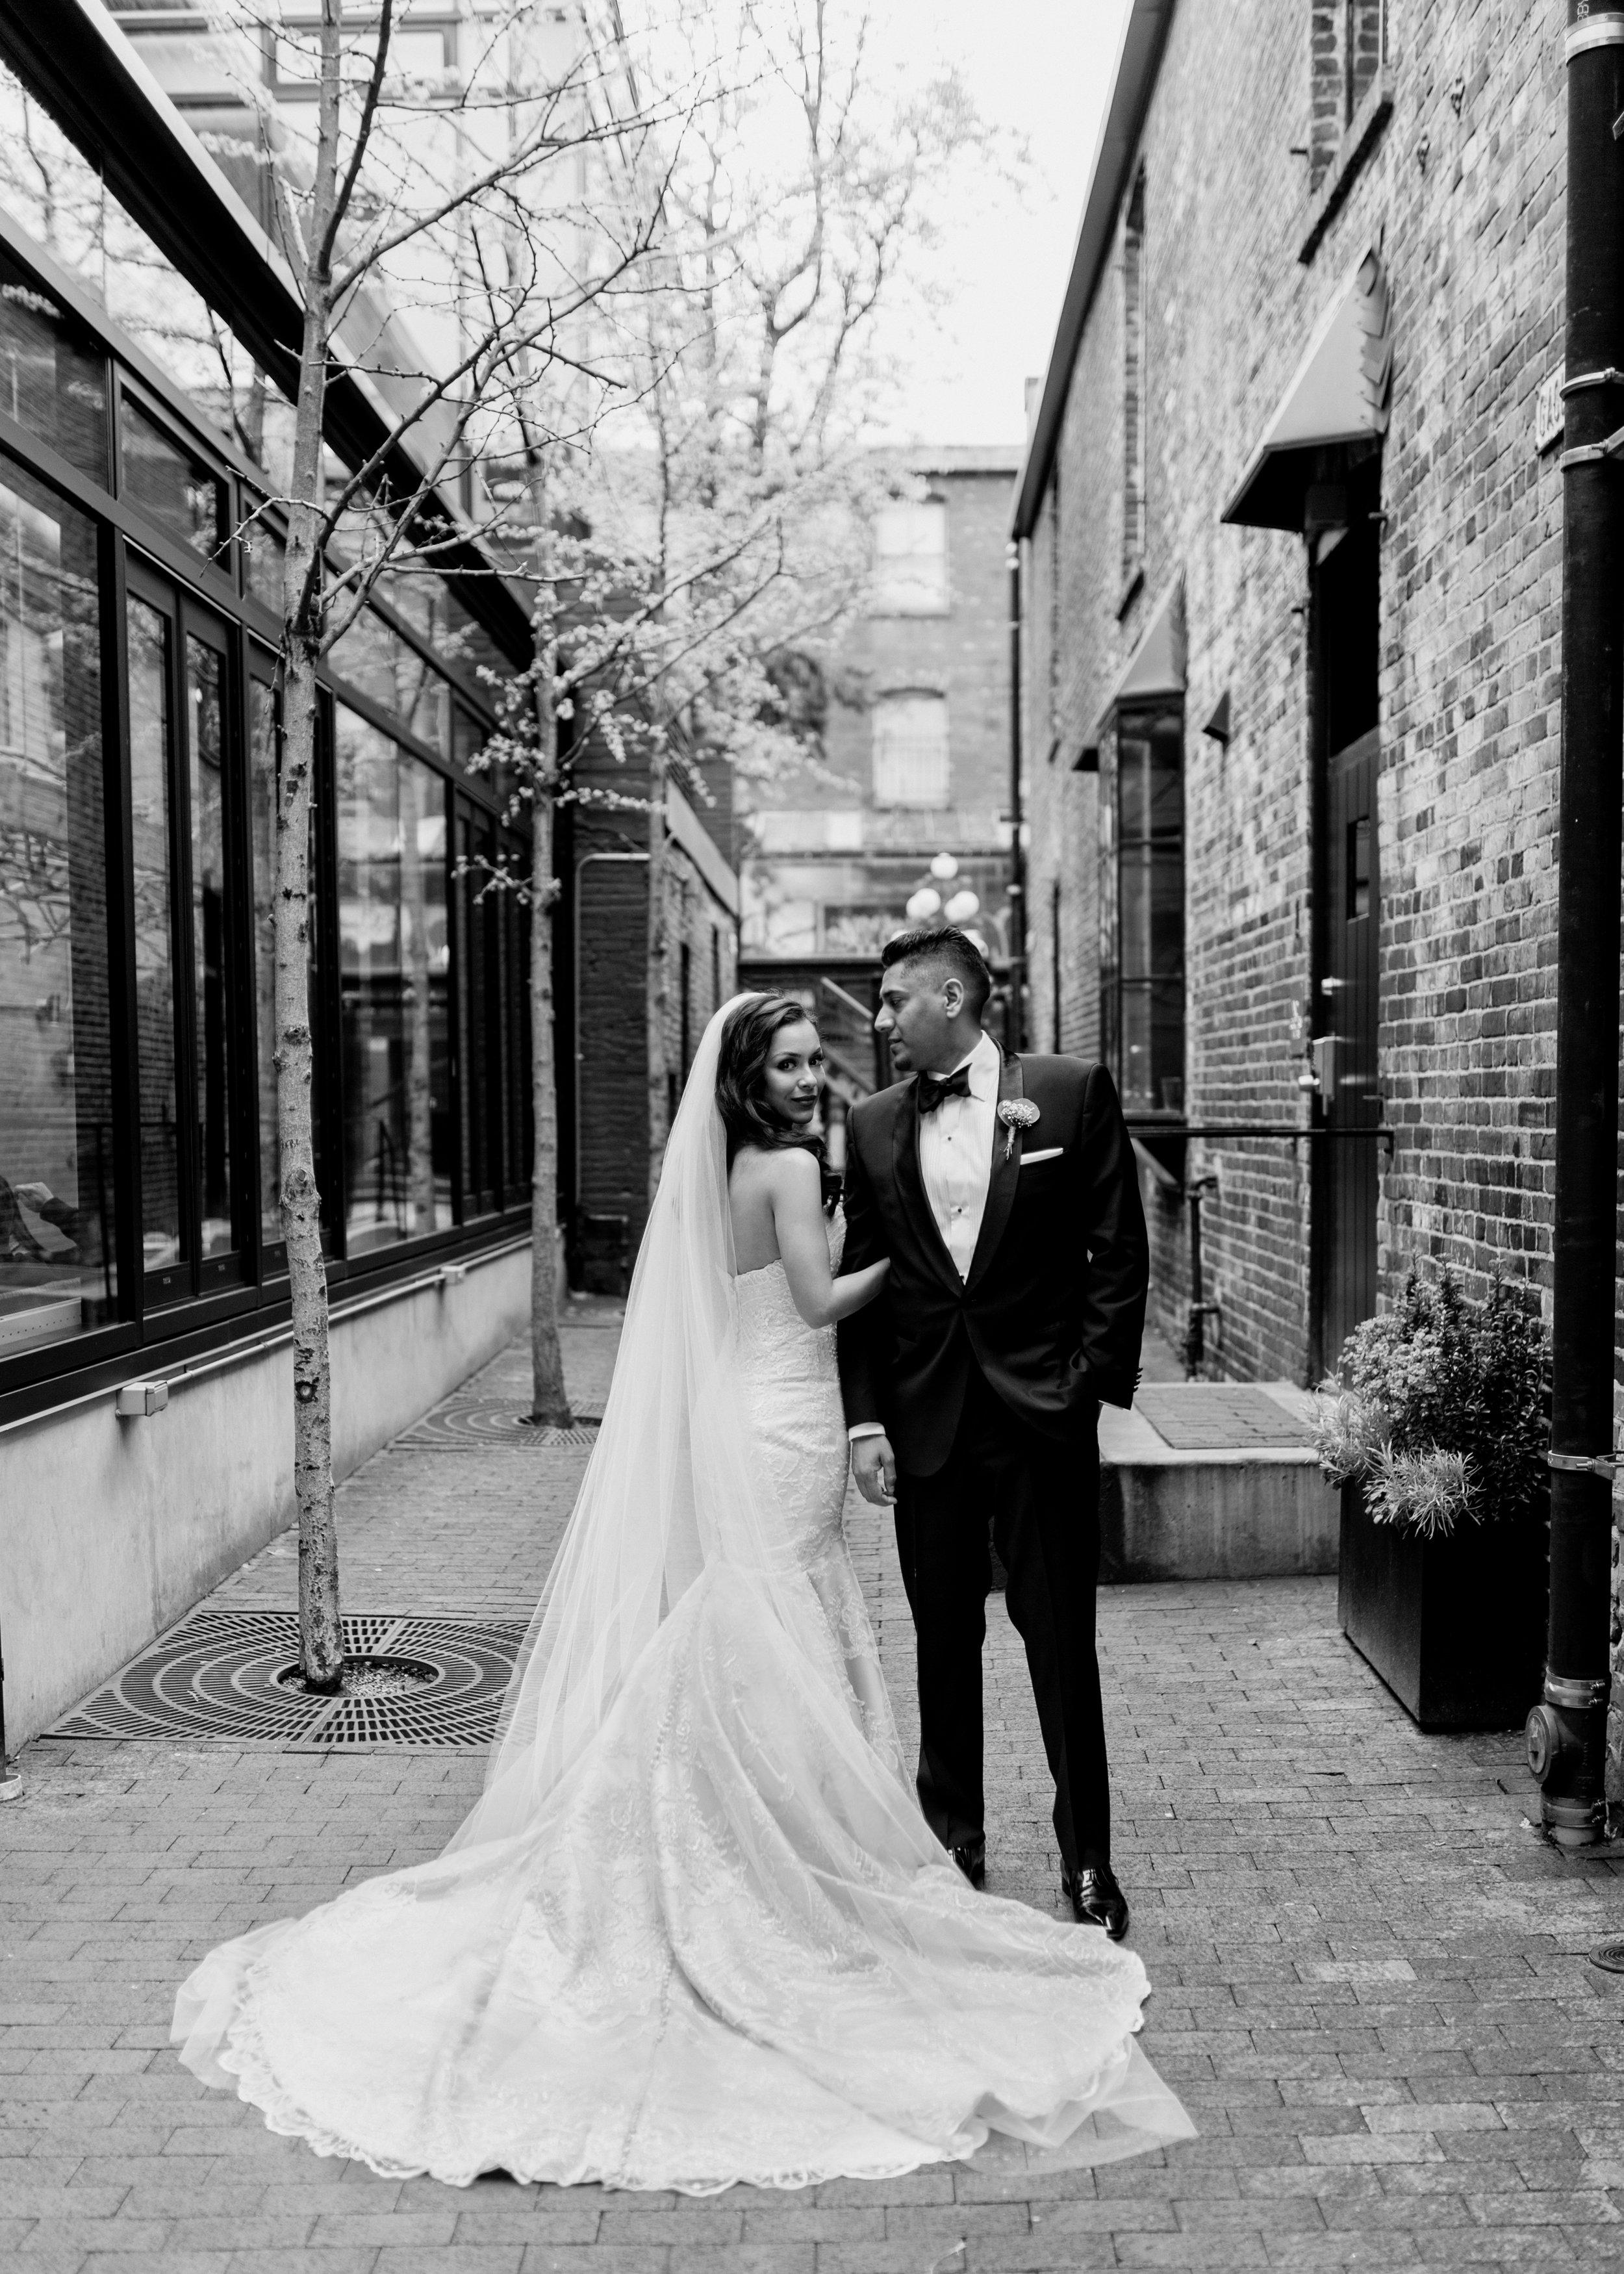 herafilms_wedding_trina_andy_hera_selects-44.jpg